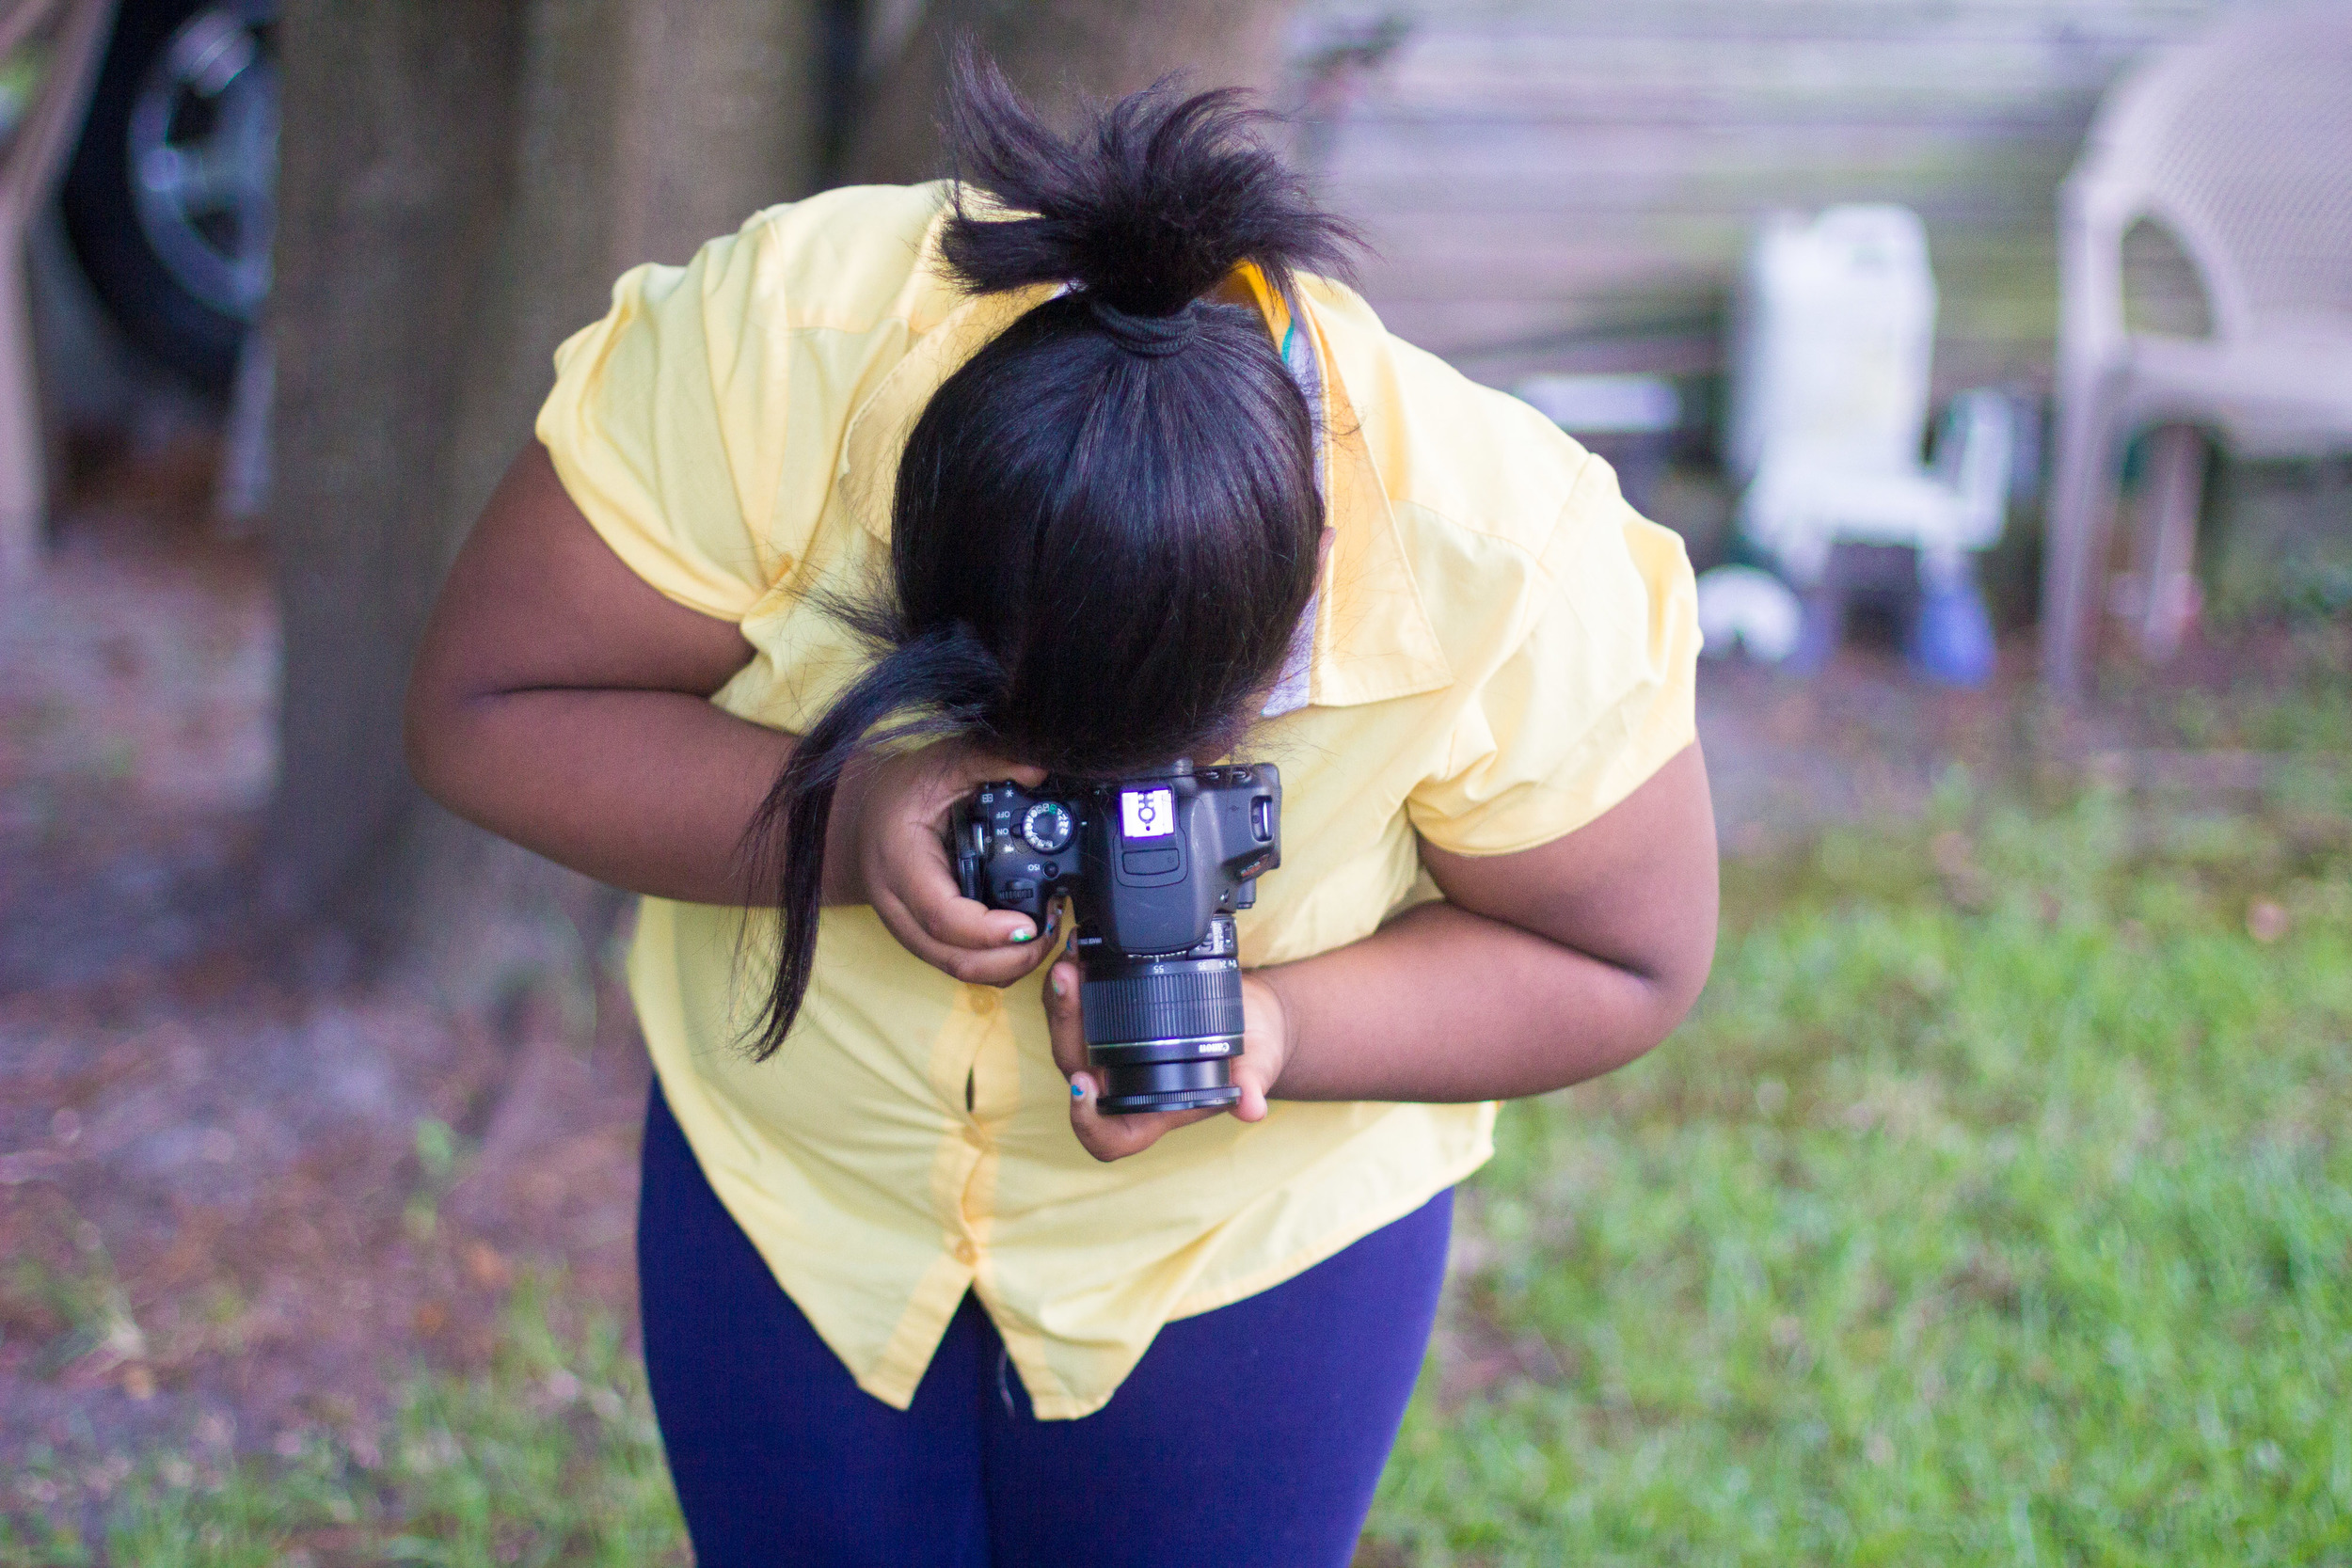 Teaching my niece to shoot photos in Greenville North Carolina